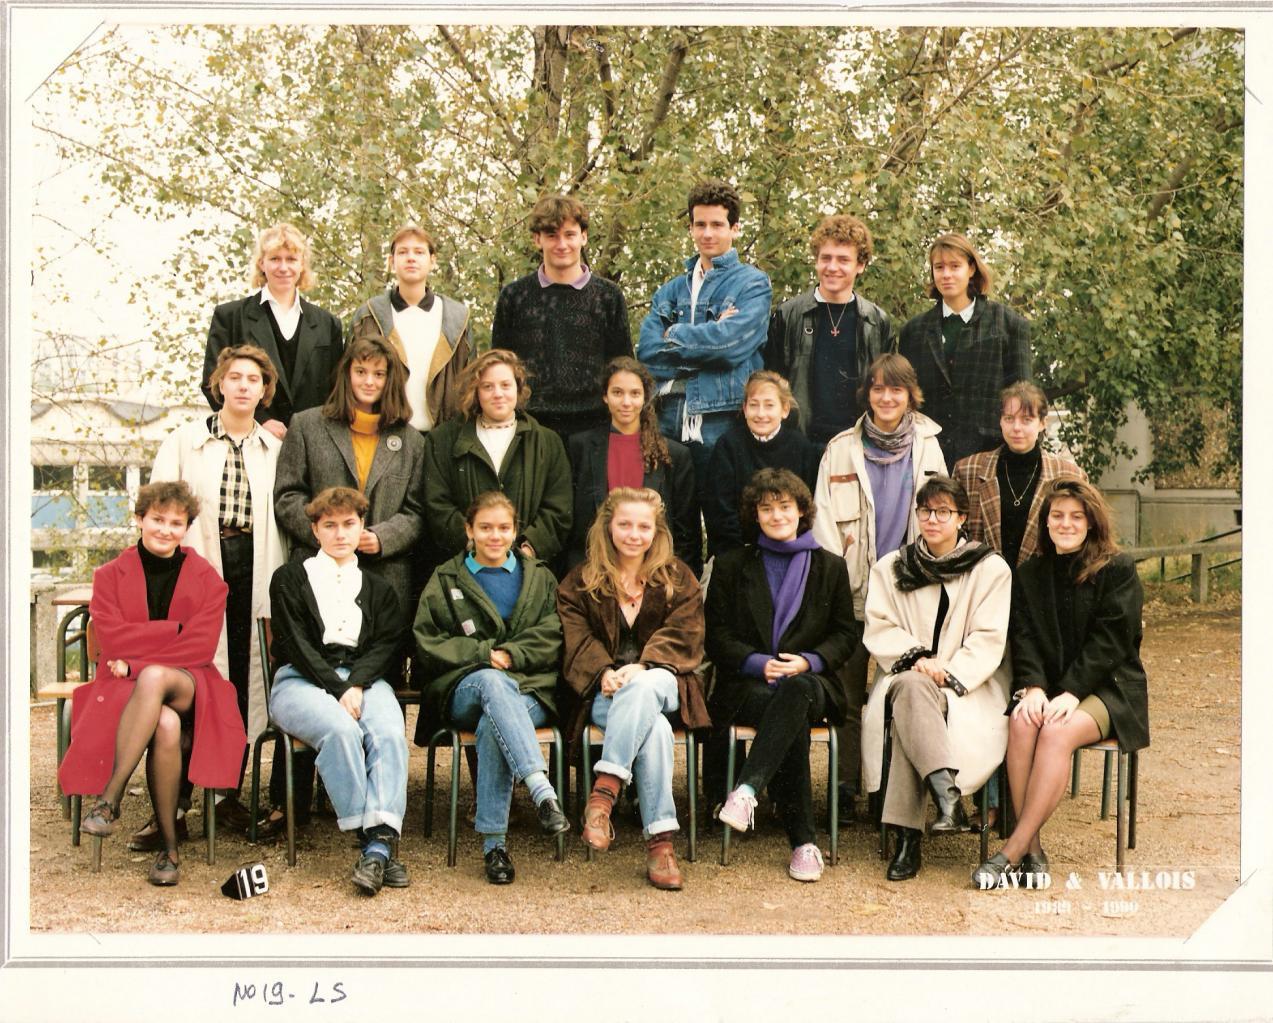 1990 - LS